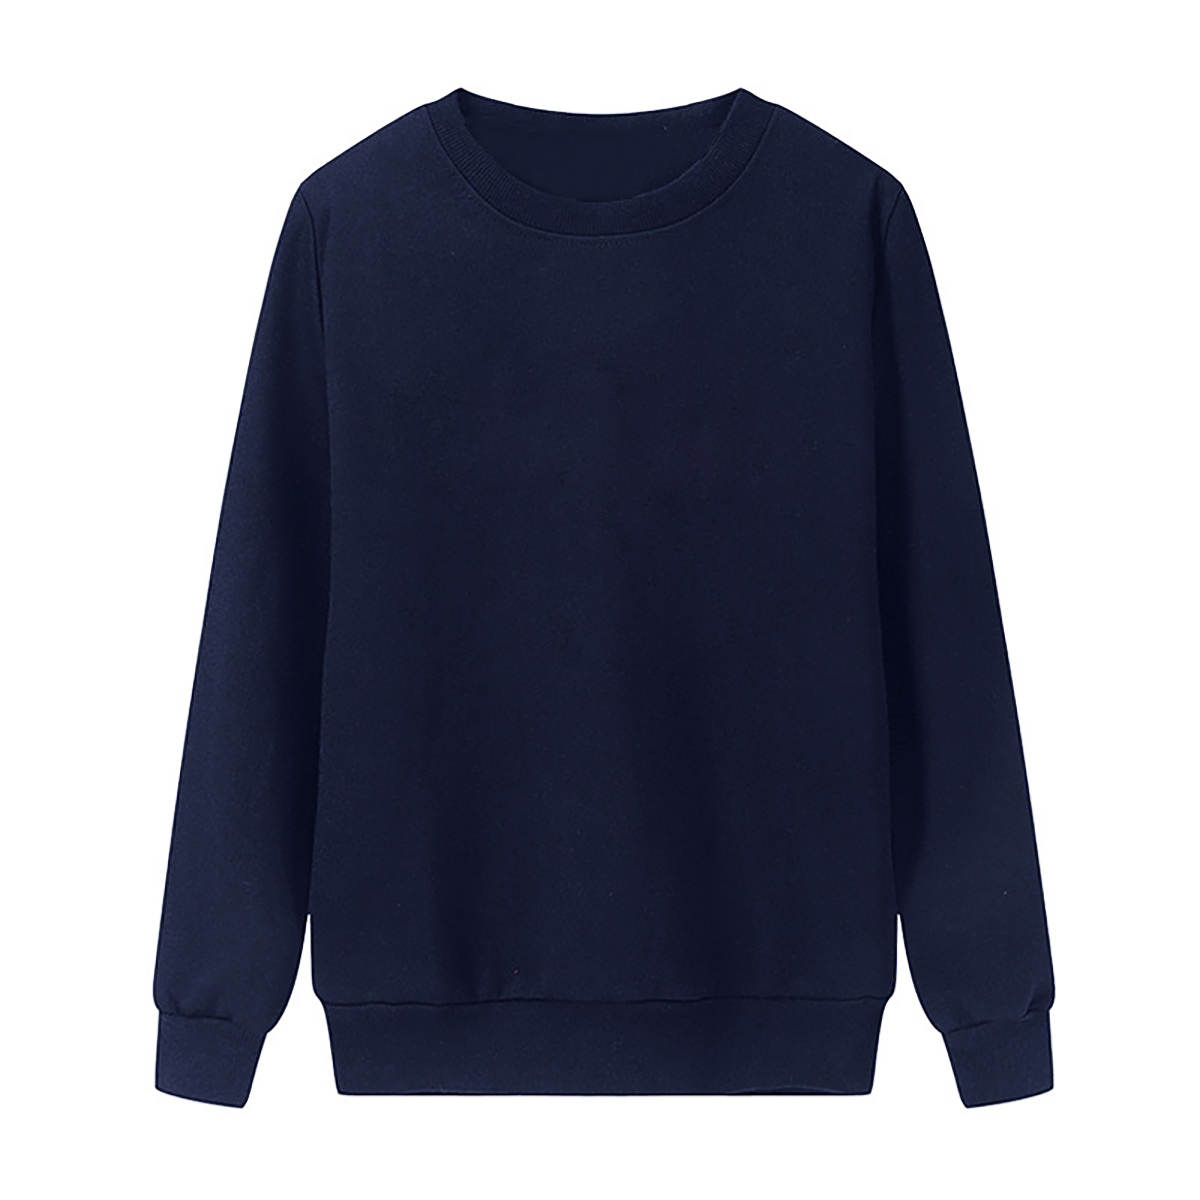 Solid Color Sweatshirt Women Casual Hoodie Fashion Winter Autumn Lasdies Pullover Fleece Black White Blue Red Gray Streetwear 12